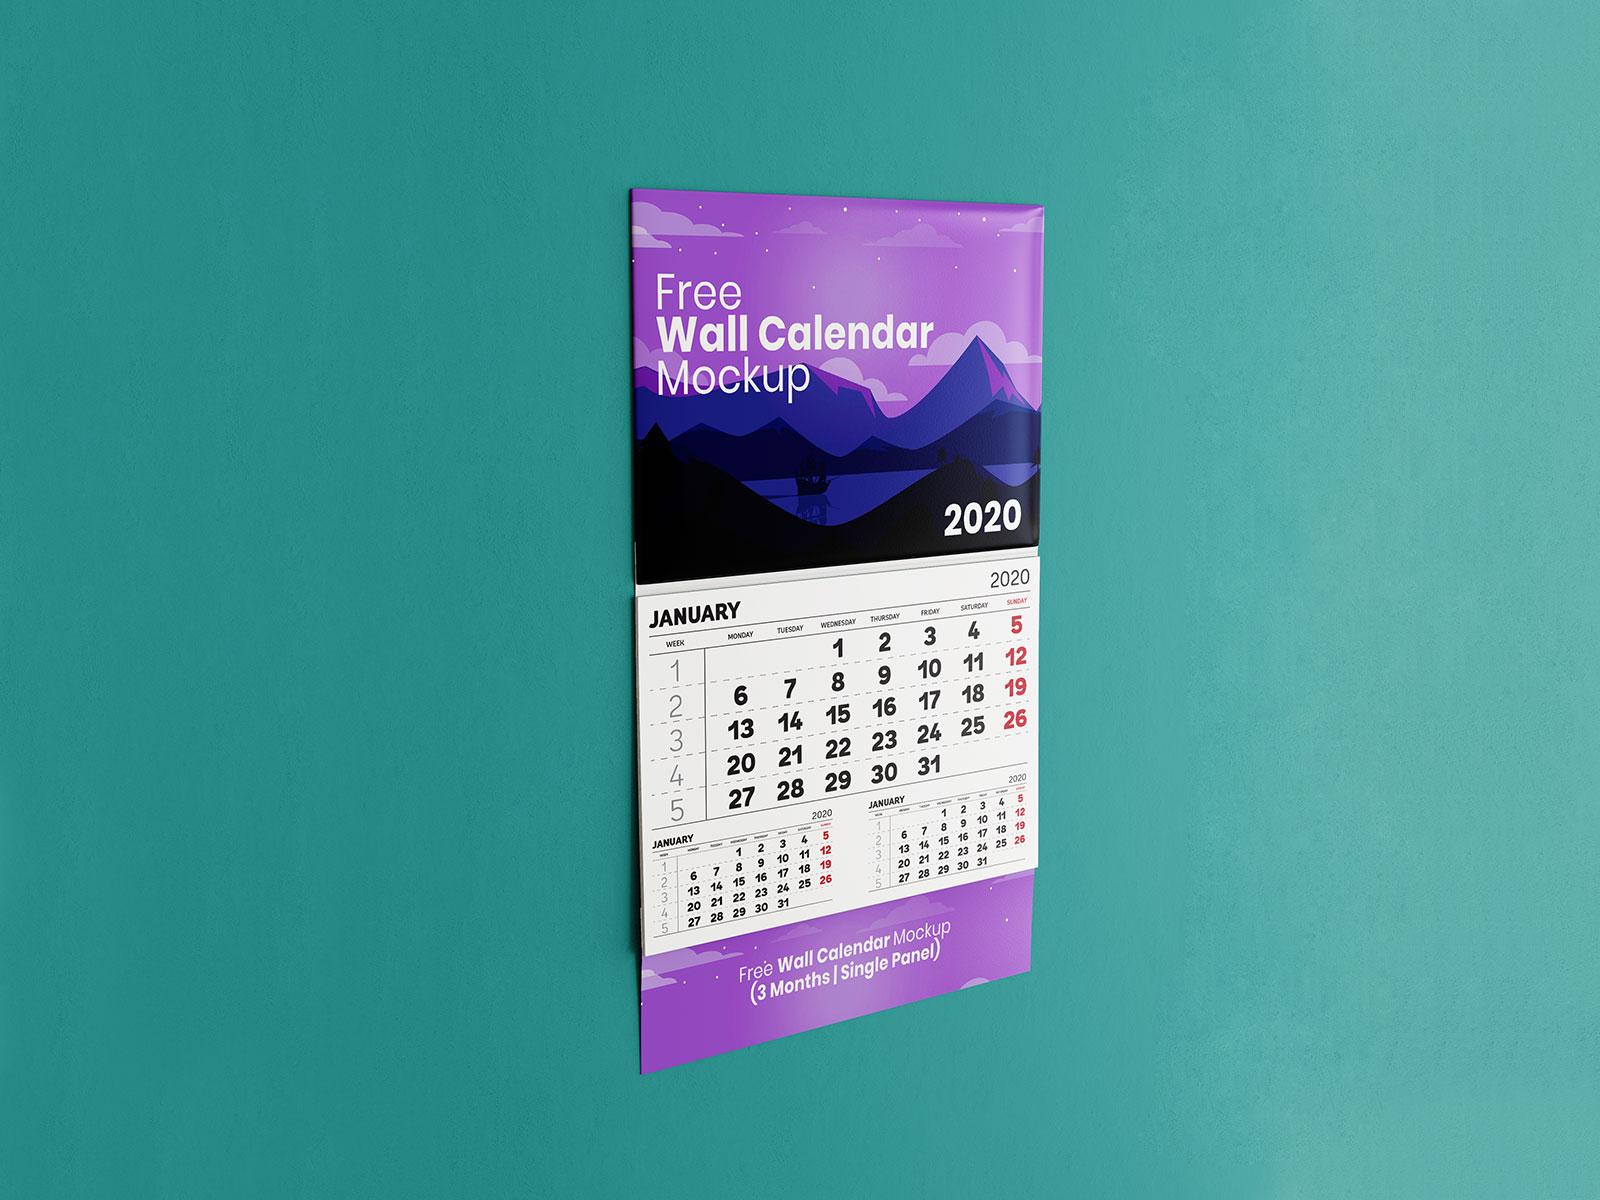 Free-Single-Panel-3-Month-Wall-Calendar-Mockup-PSD-File